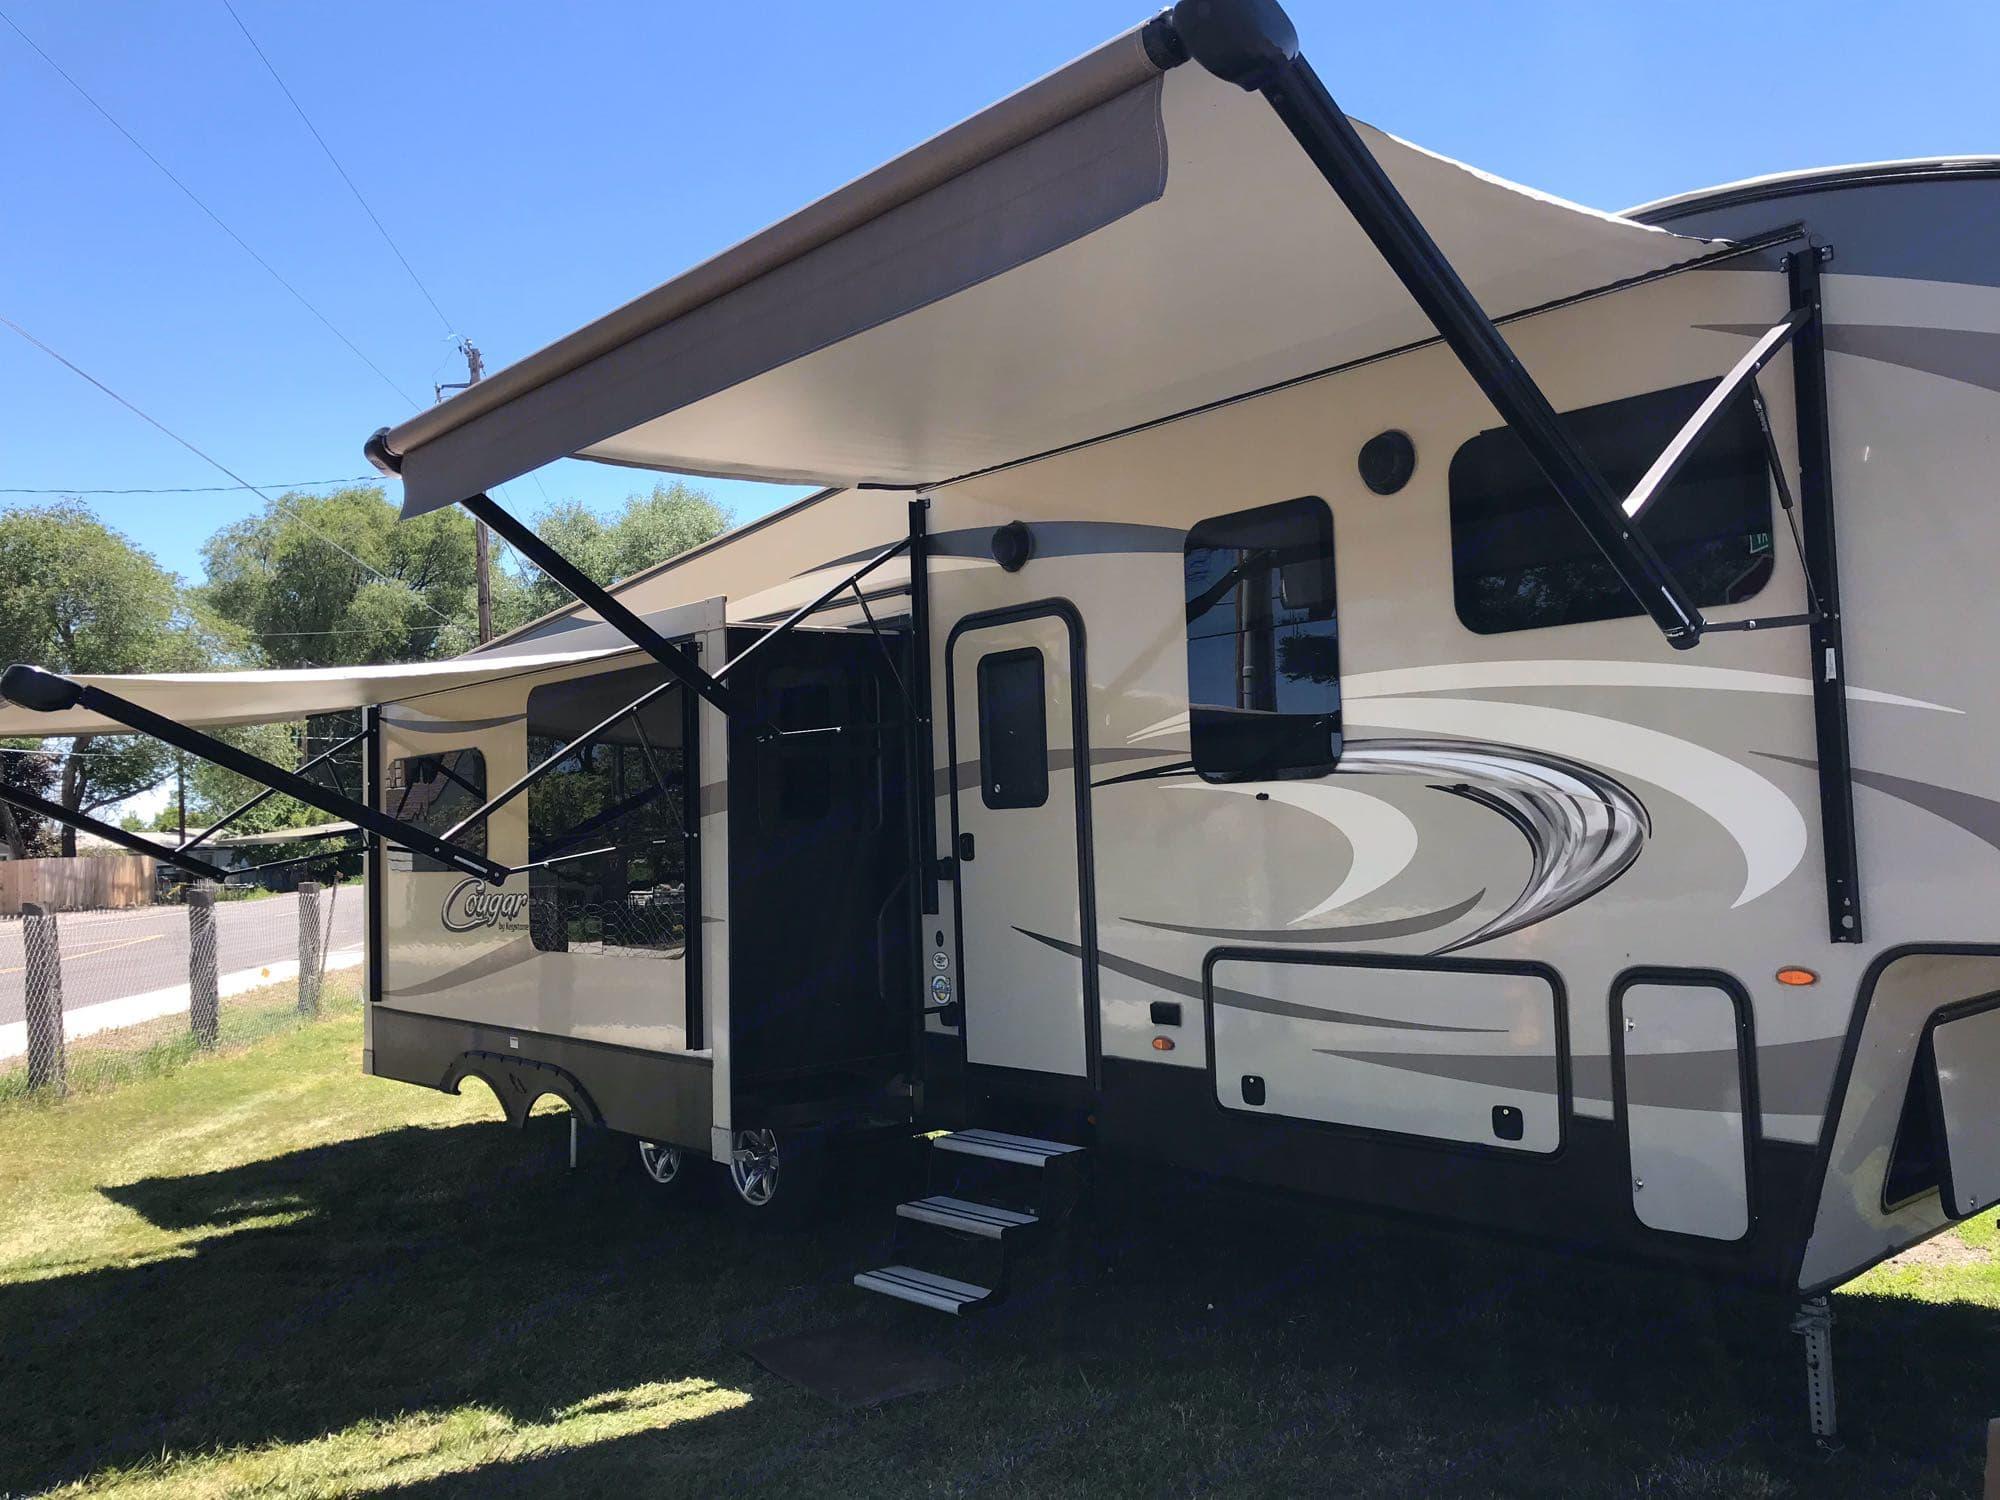 dual awnings. Keystone Cougar 336BHS 2018